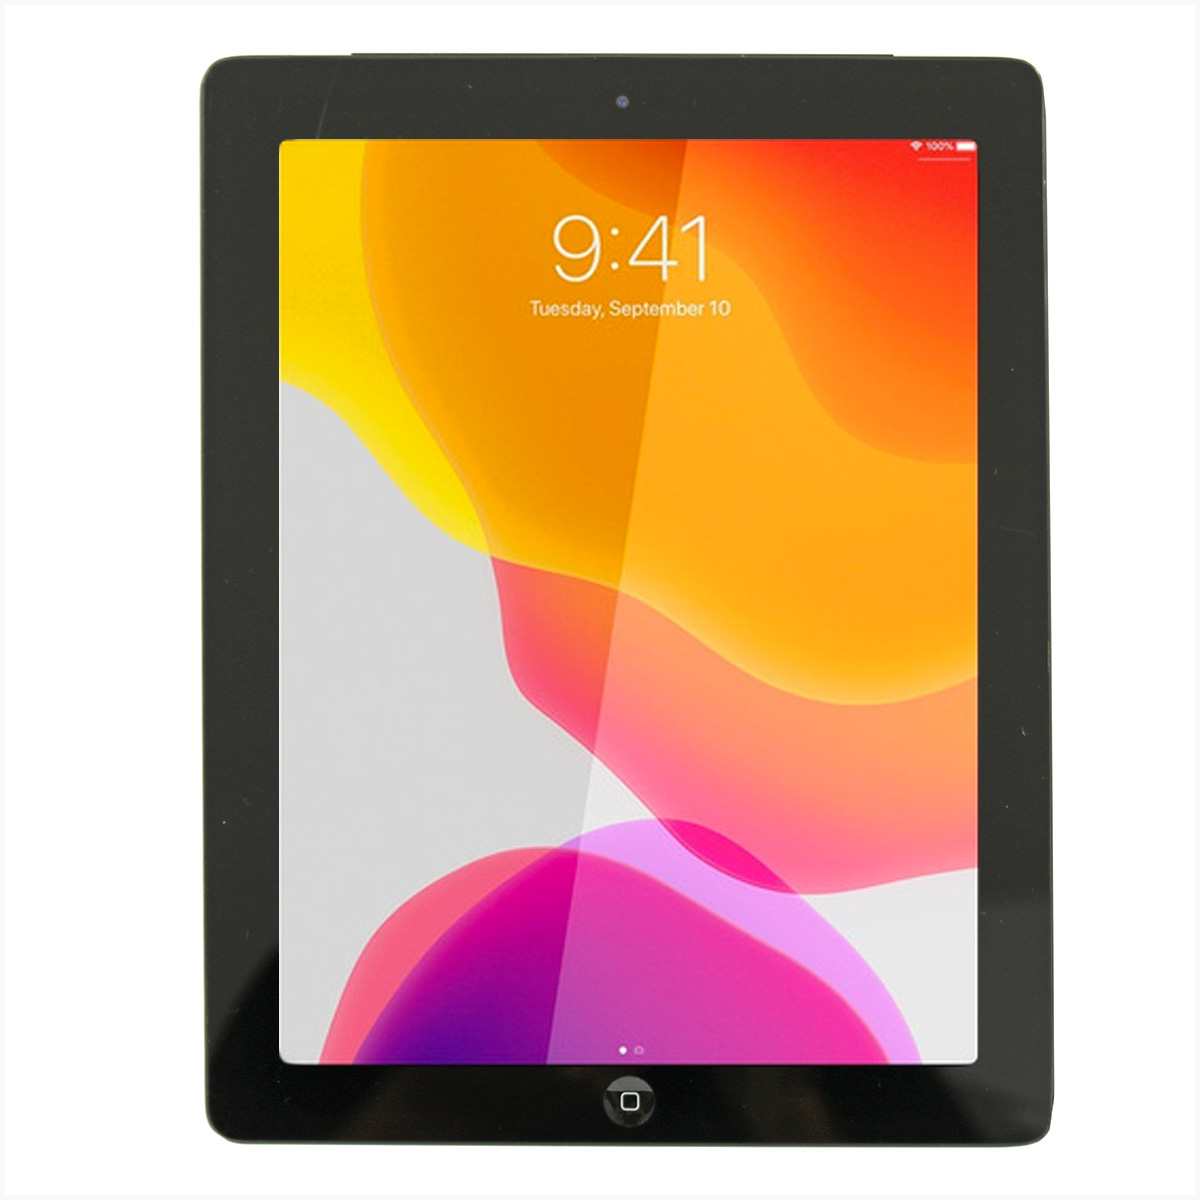 Apple iPad 3 wi-fi+4g a1430 32gb black - usado